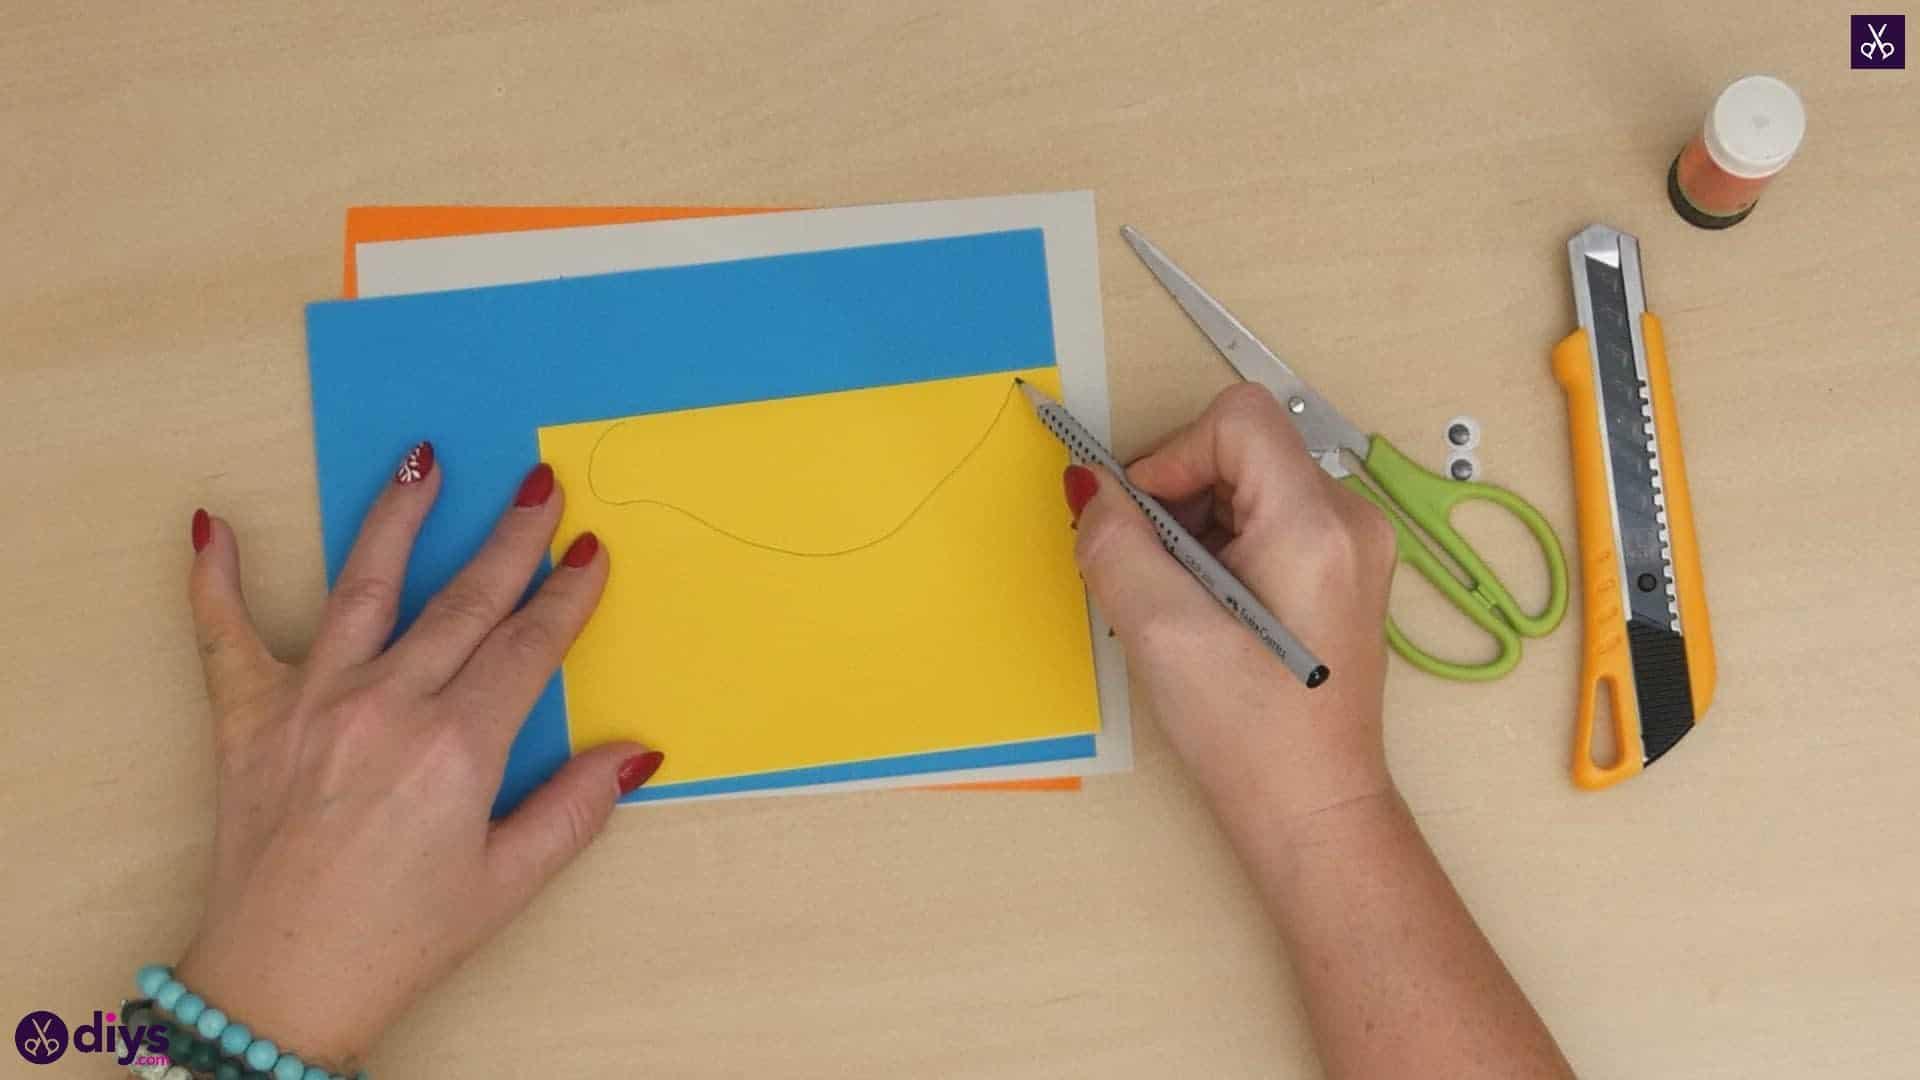 Diy easy paper bird step 2a